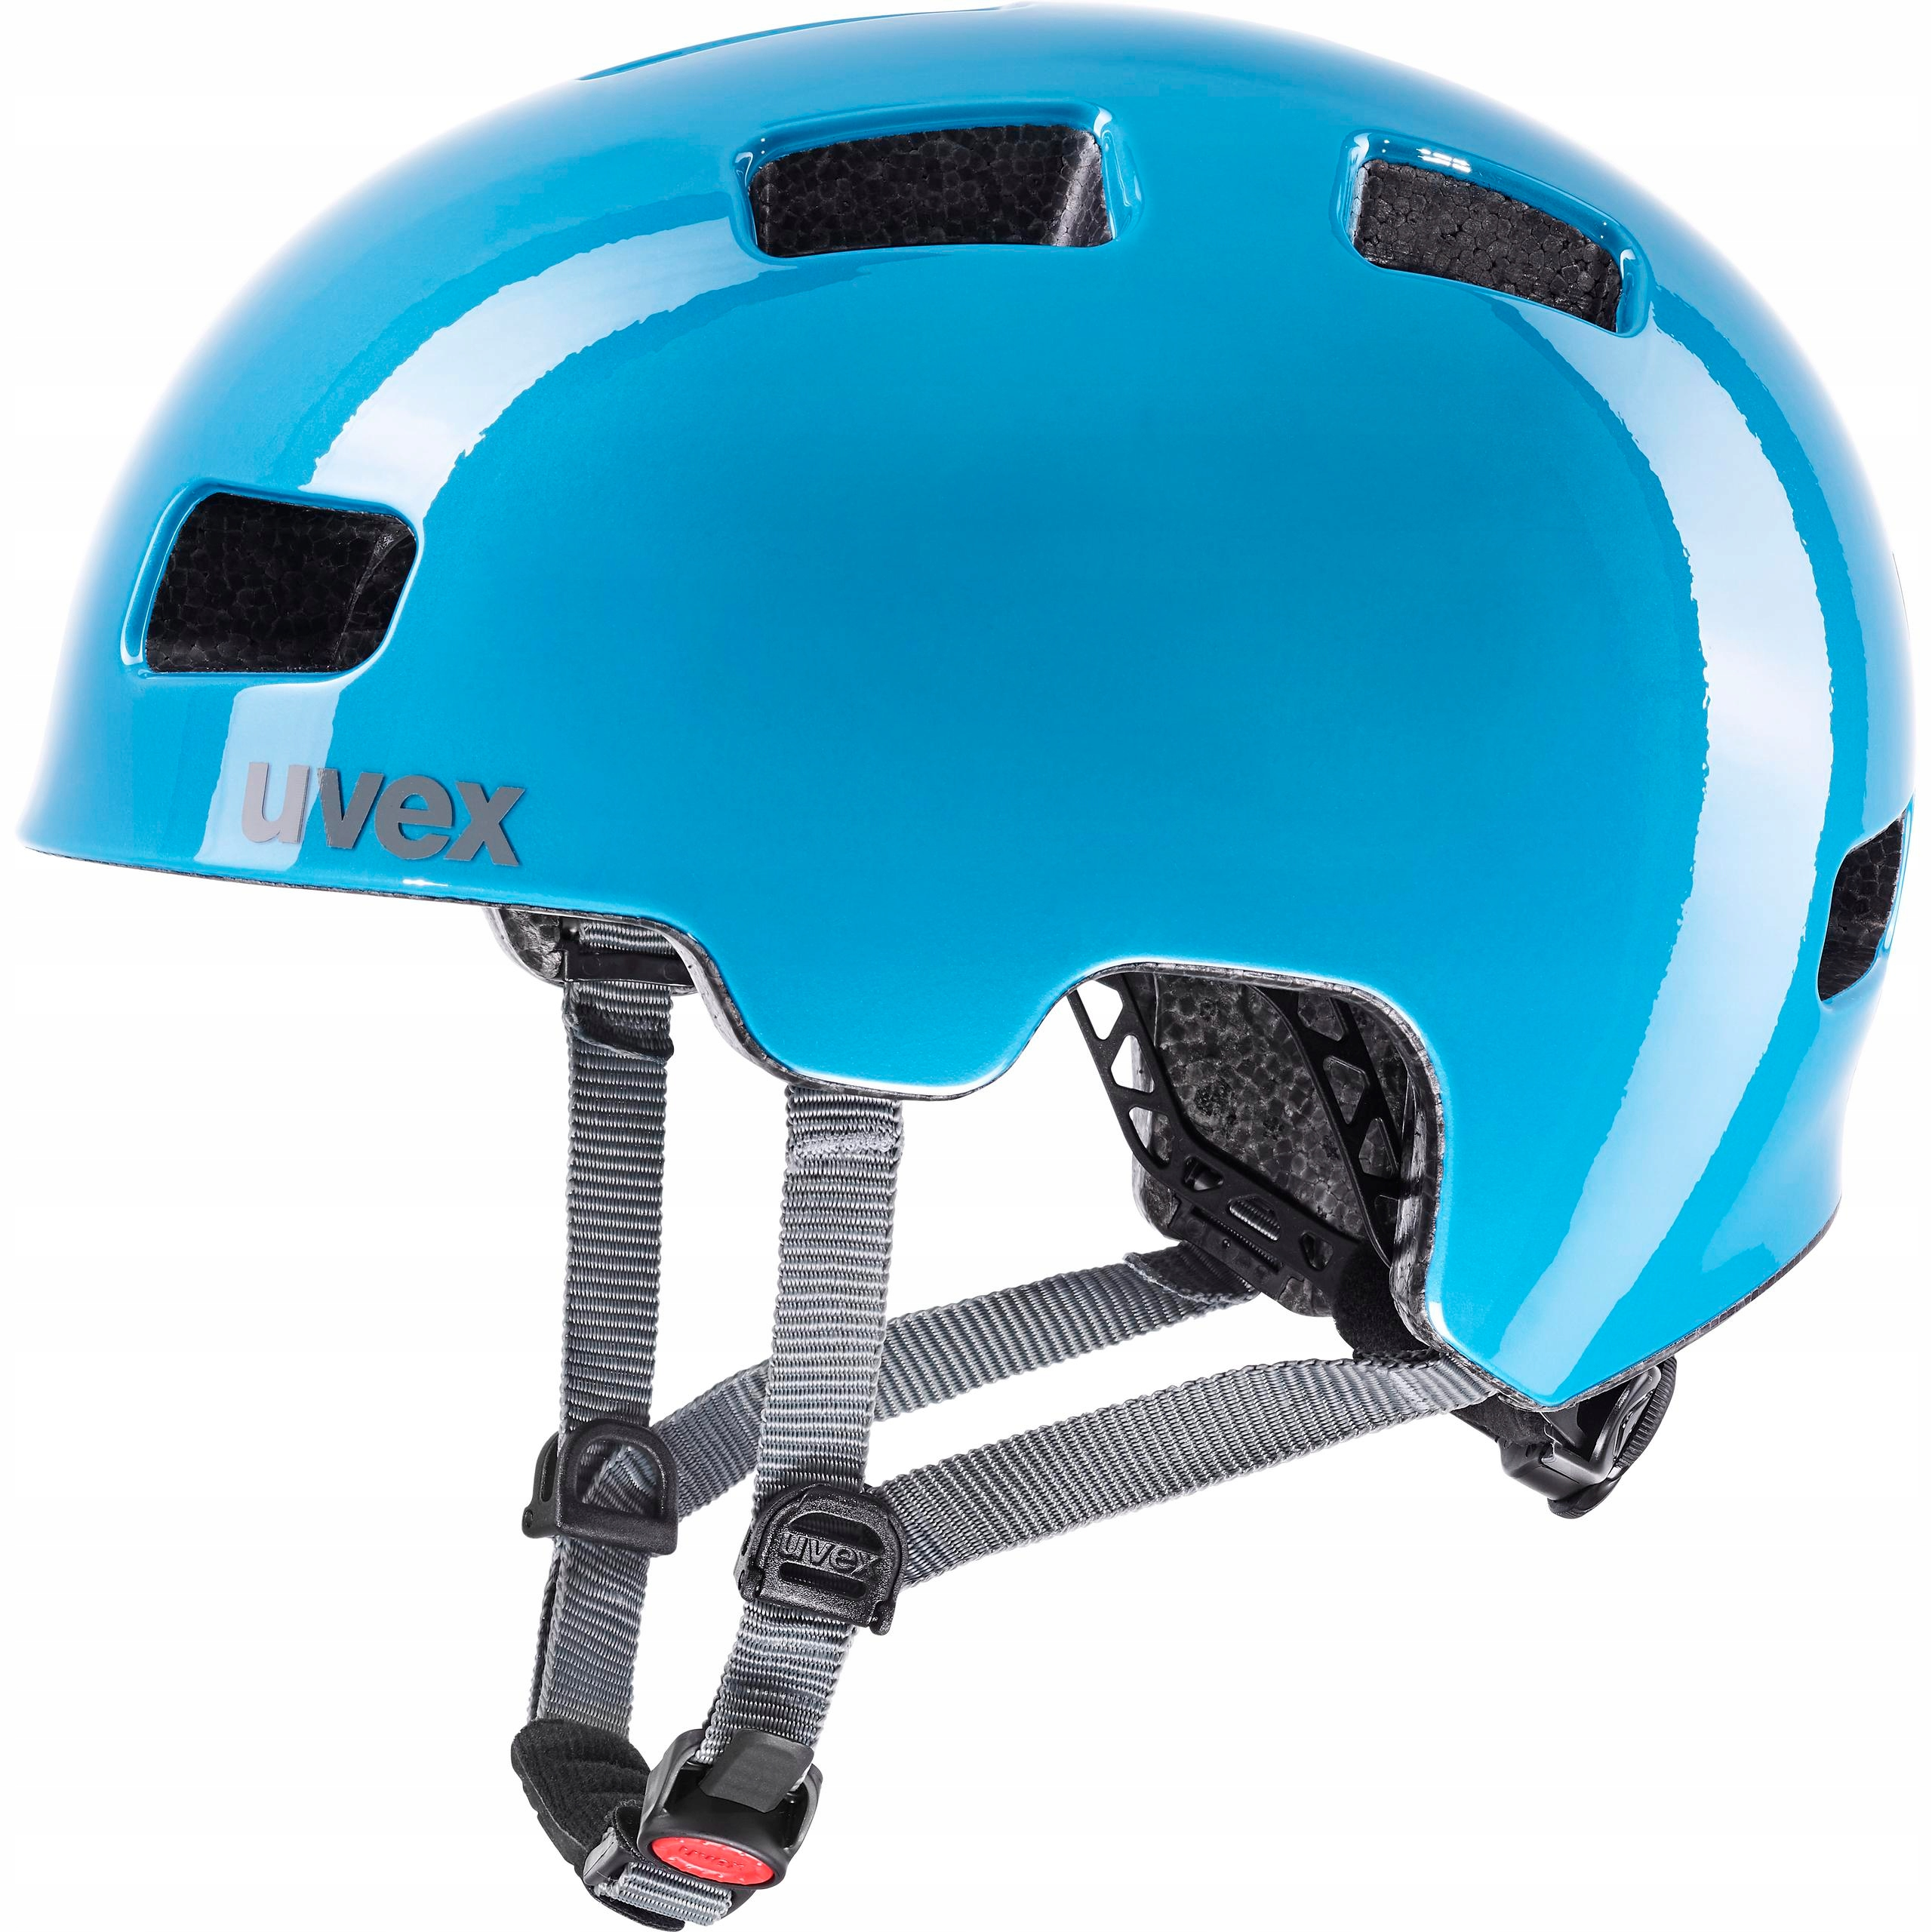 Kask rowerowy na hulajnogę Uvex Uvex HLMT 4 51-55